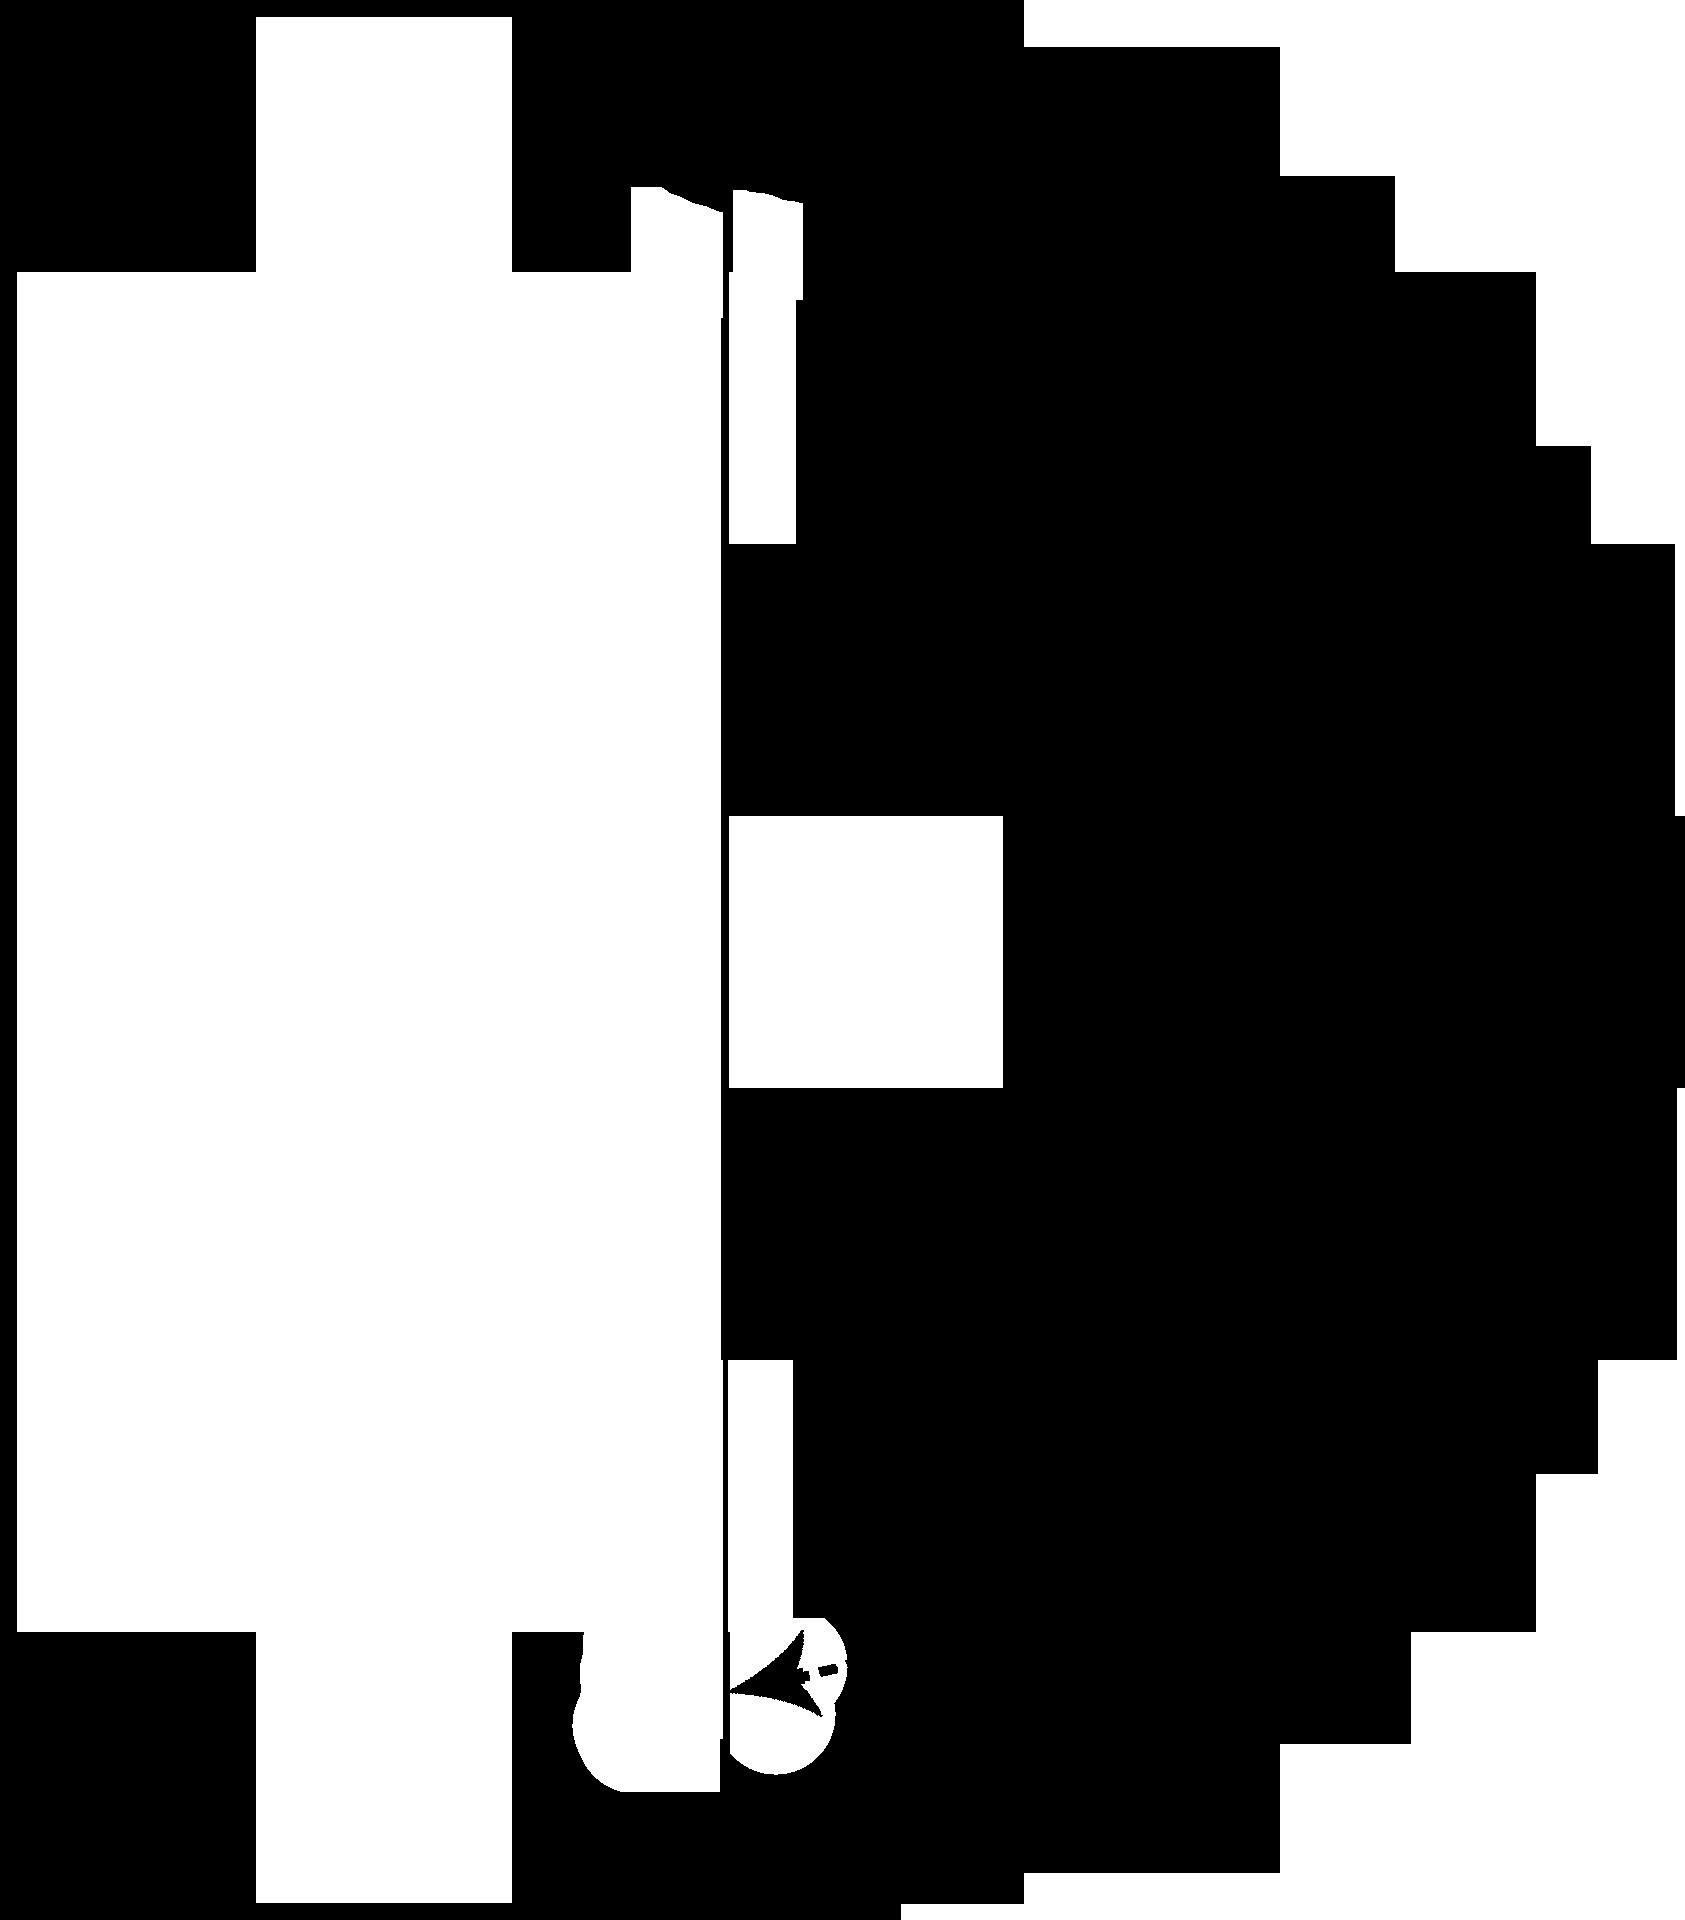 File schody wachlarzowe wikimedia commons - Medidas de escaleras ...